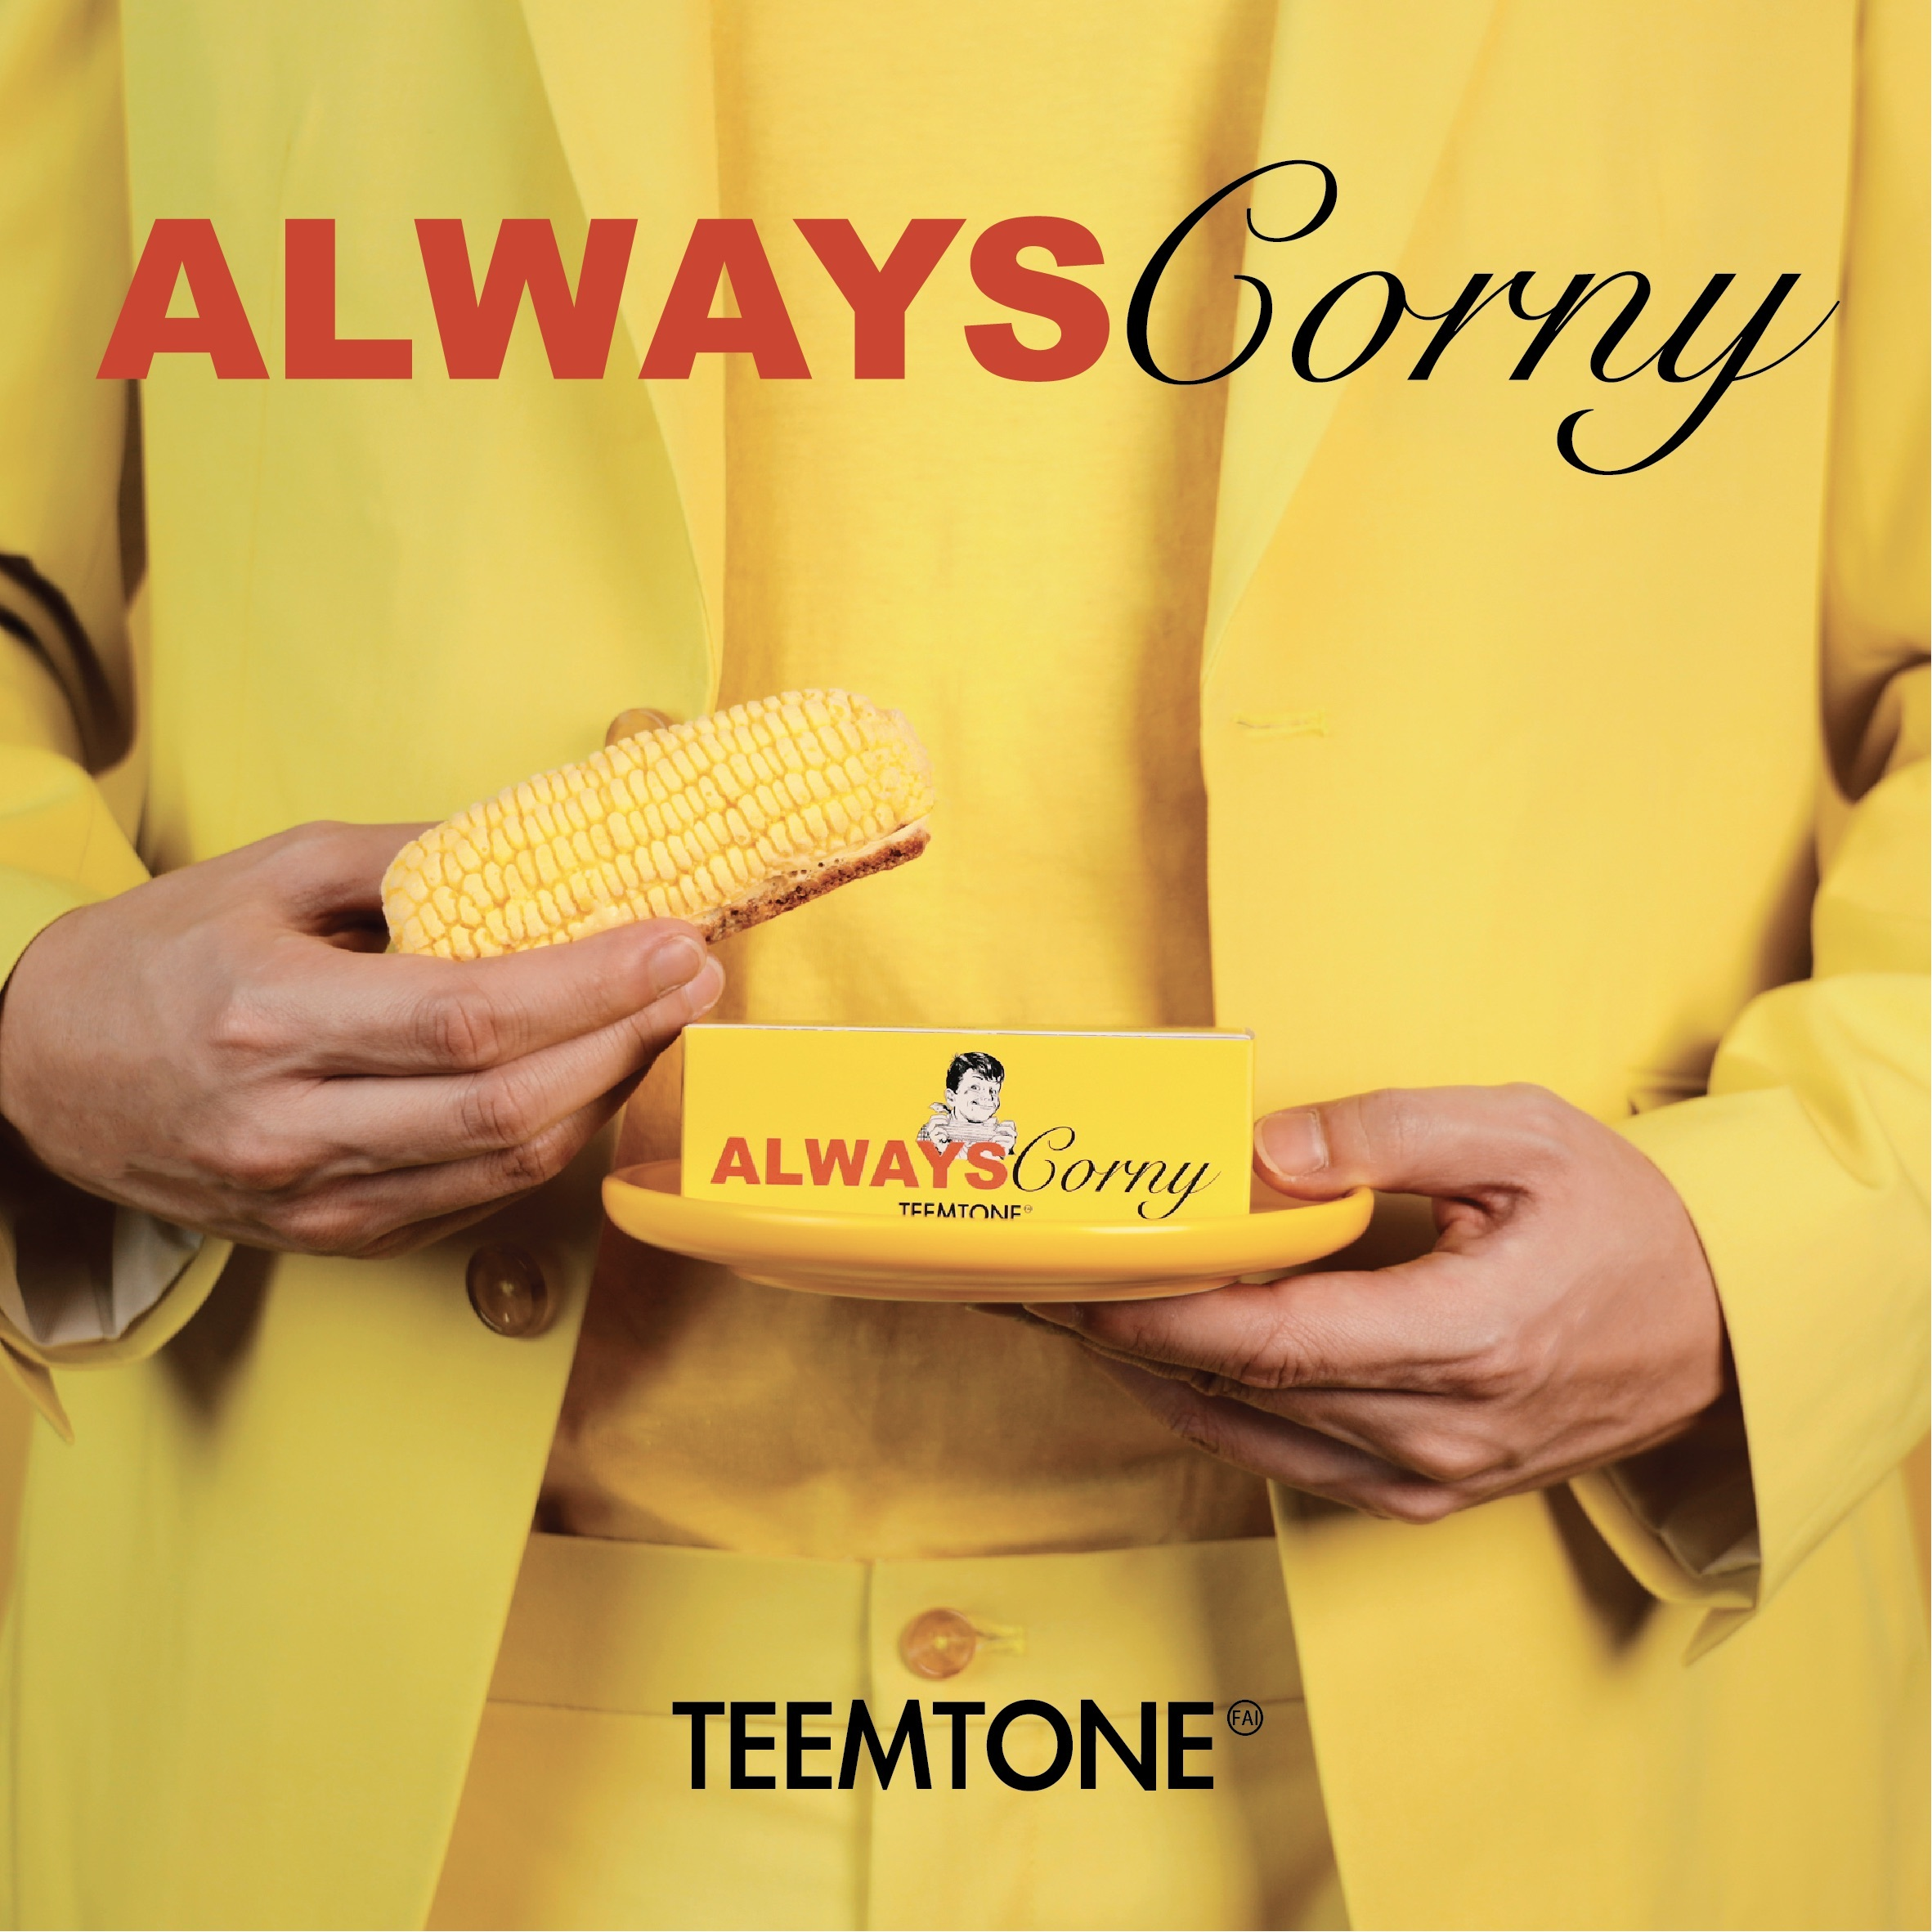 Teemtonefai always corny